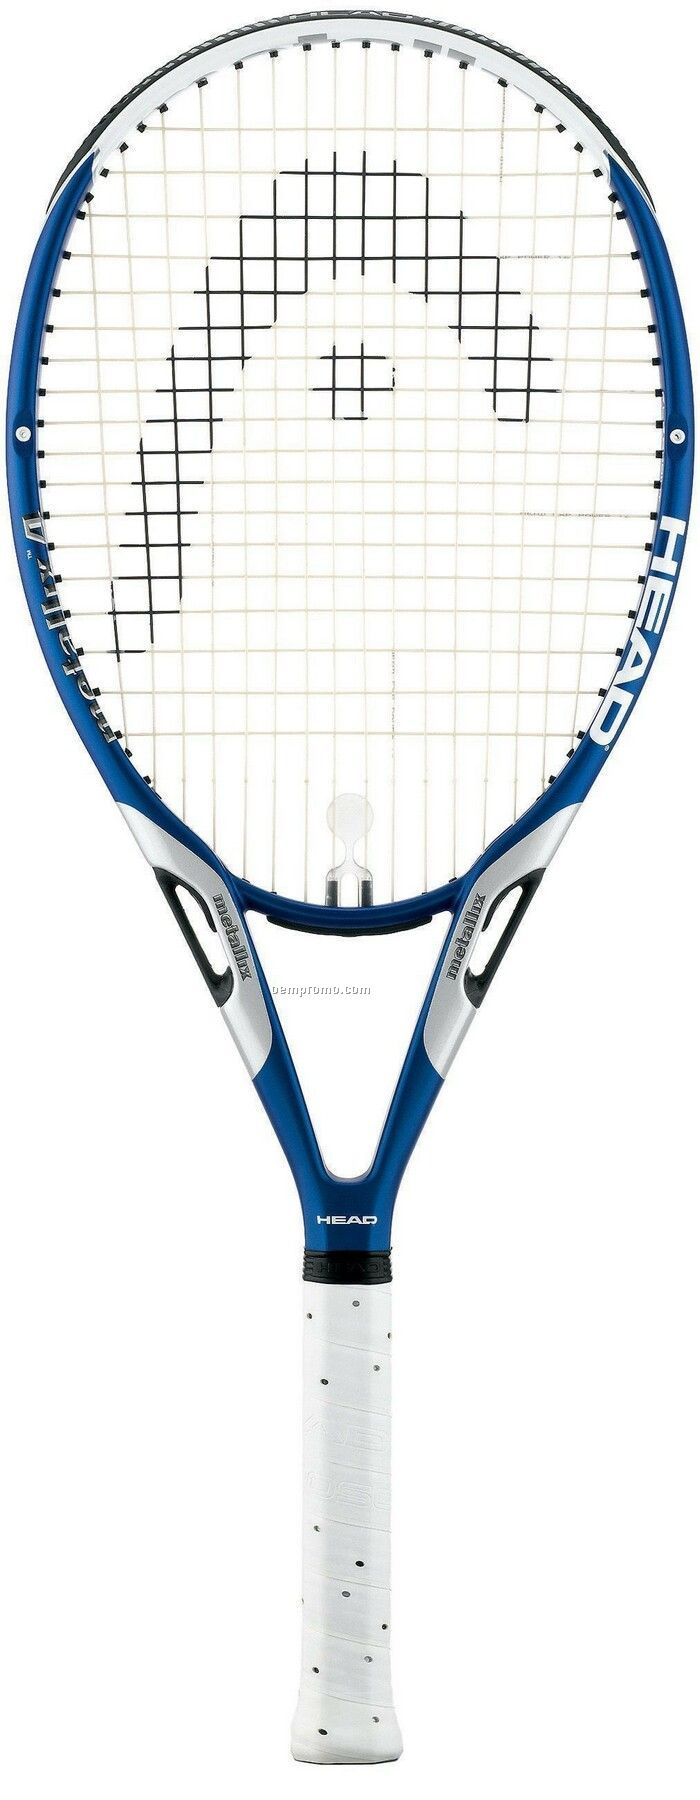 230018 Tennis Racquets